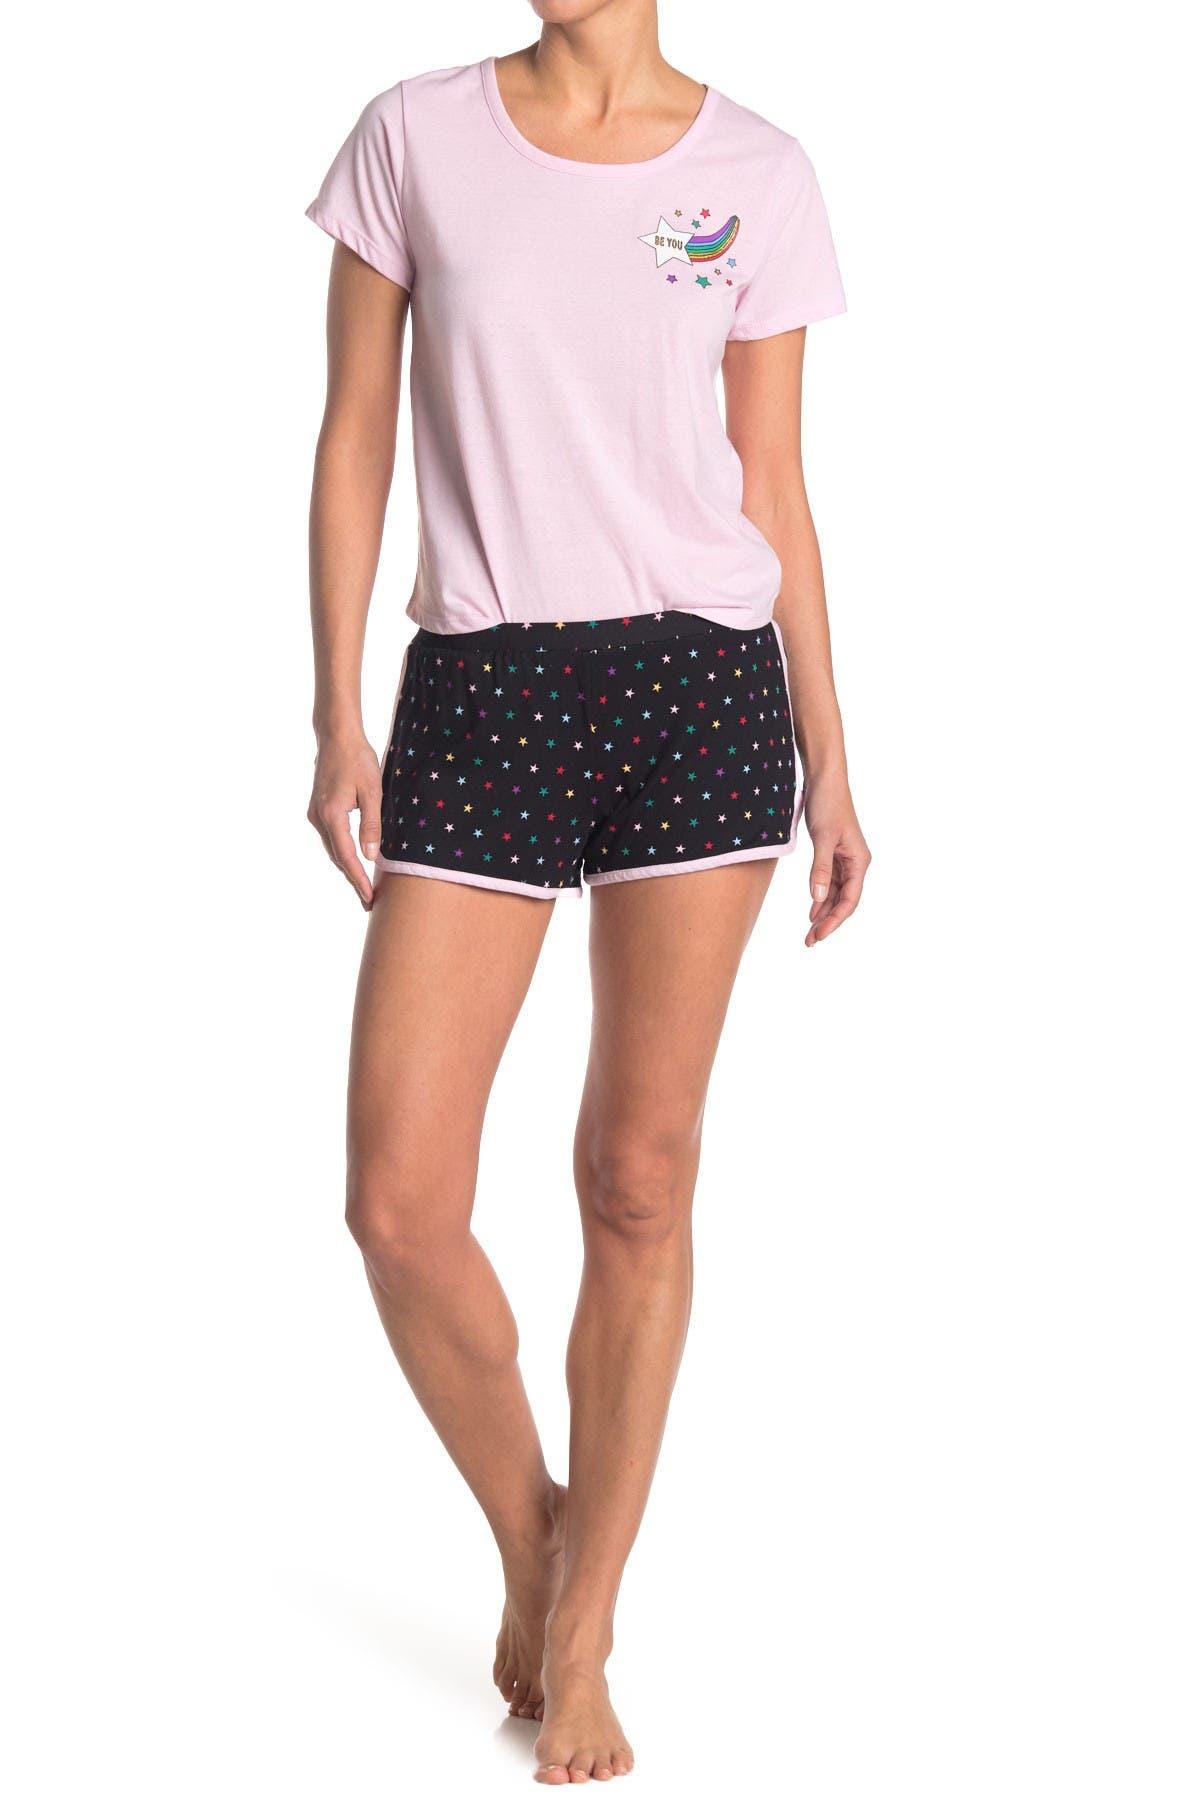 Image of PJ Couture Star 2-Piece T-Shirt & Shorts PJ Set